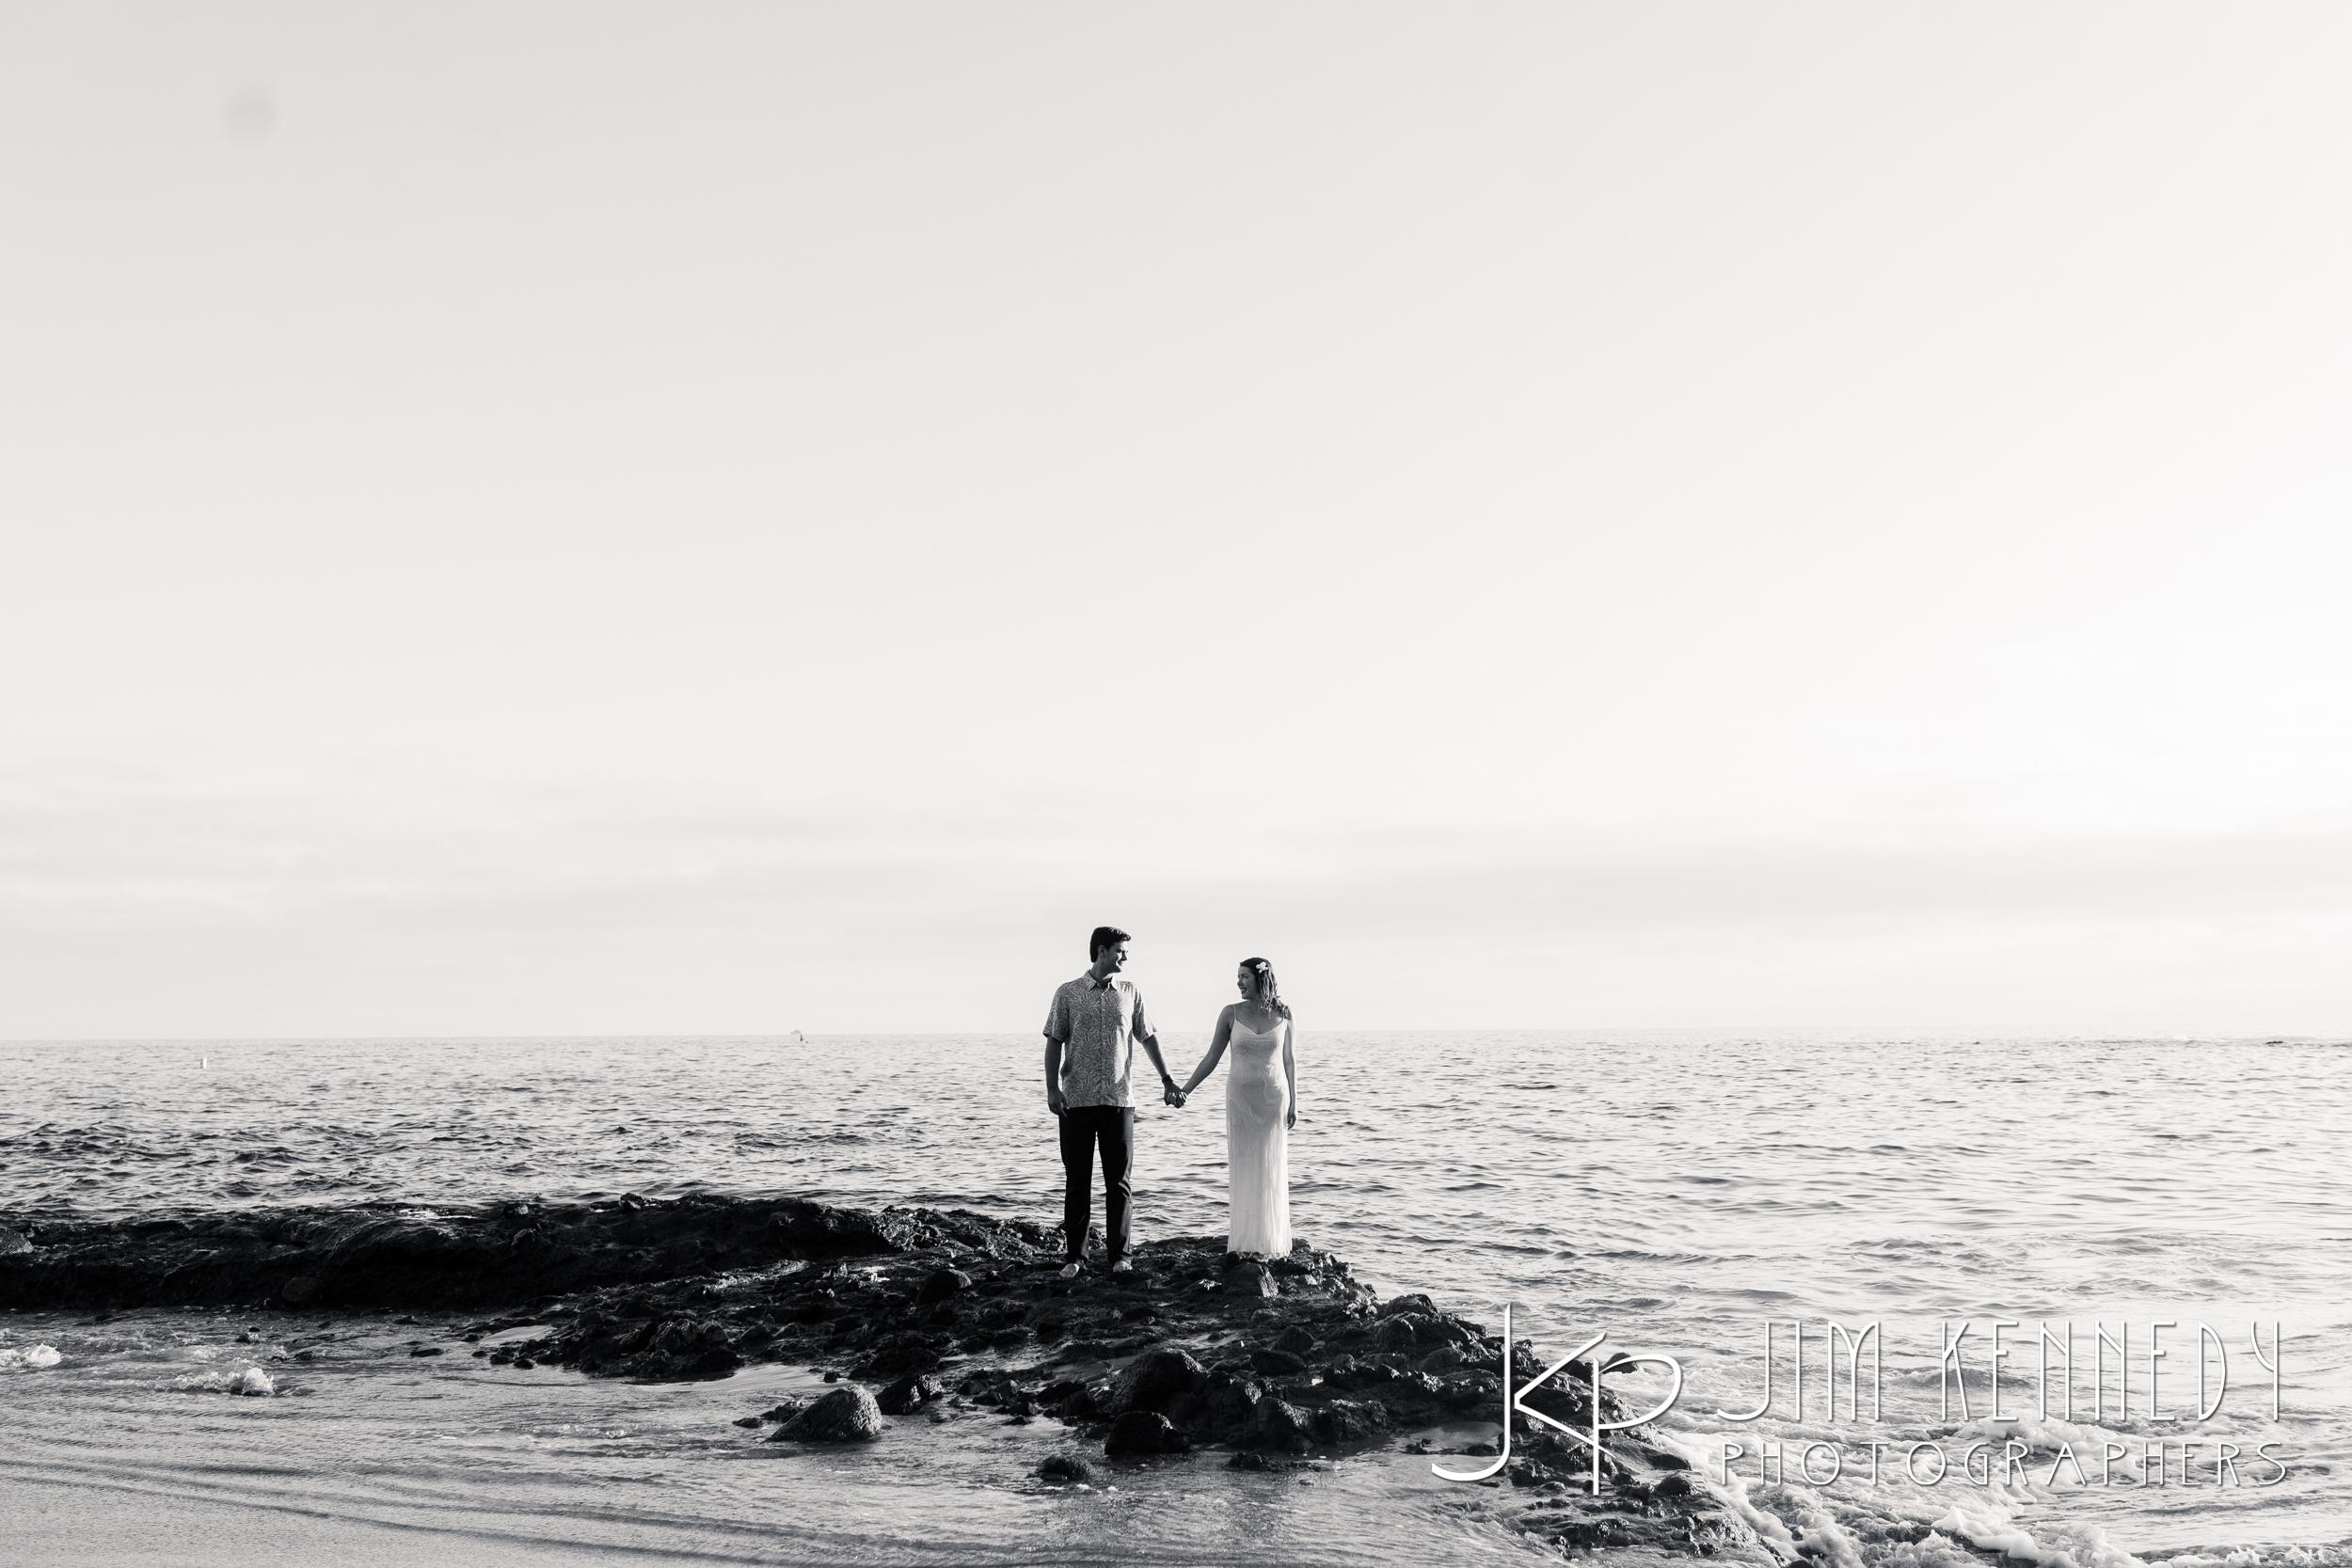 laguna-beach-engagement-005.JPG